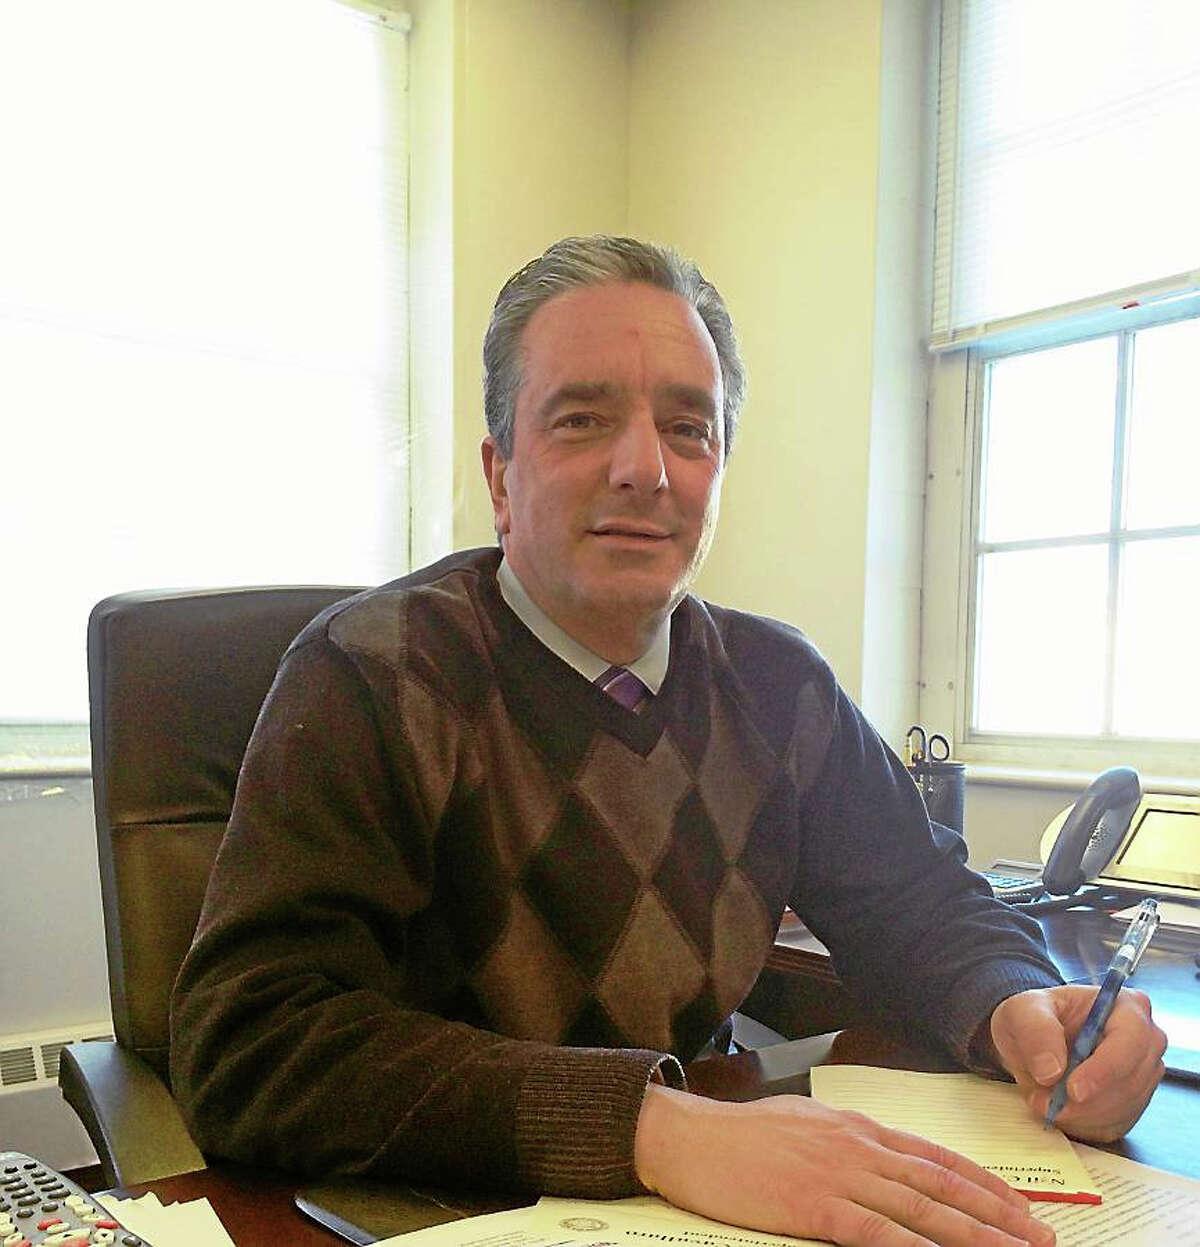 West Haven Schools Superintendent Neil Cavallaro.